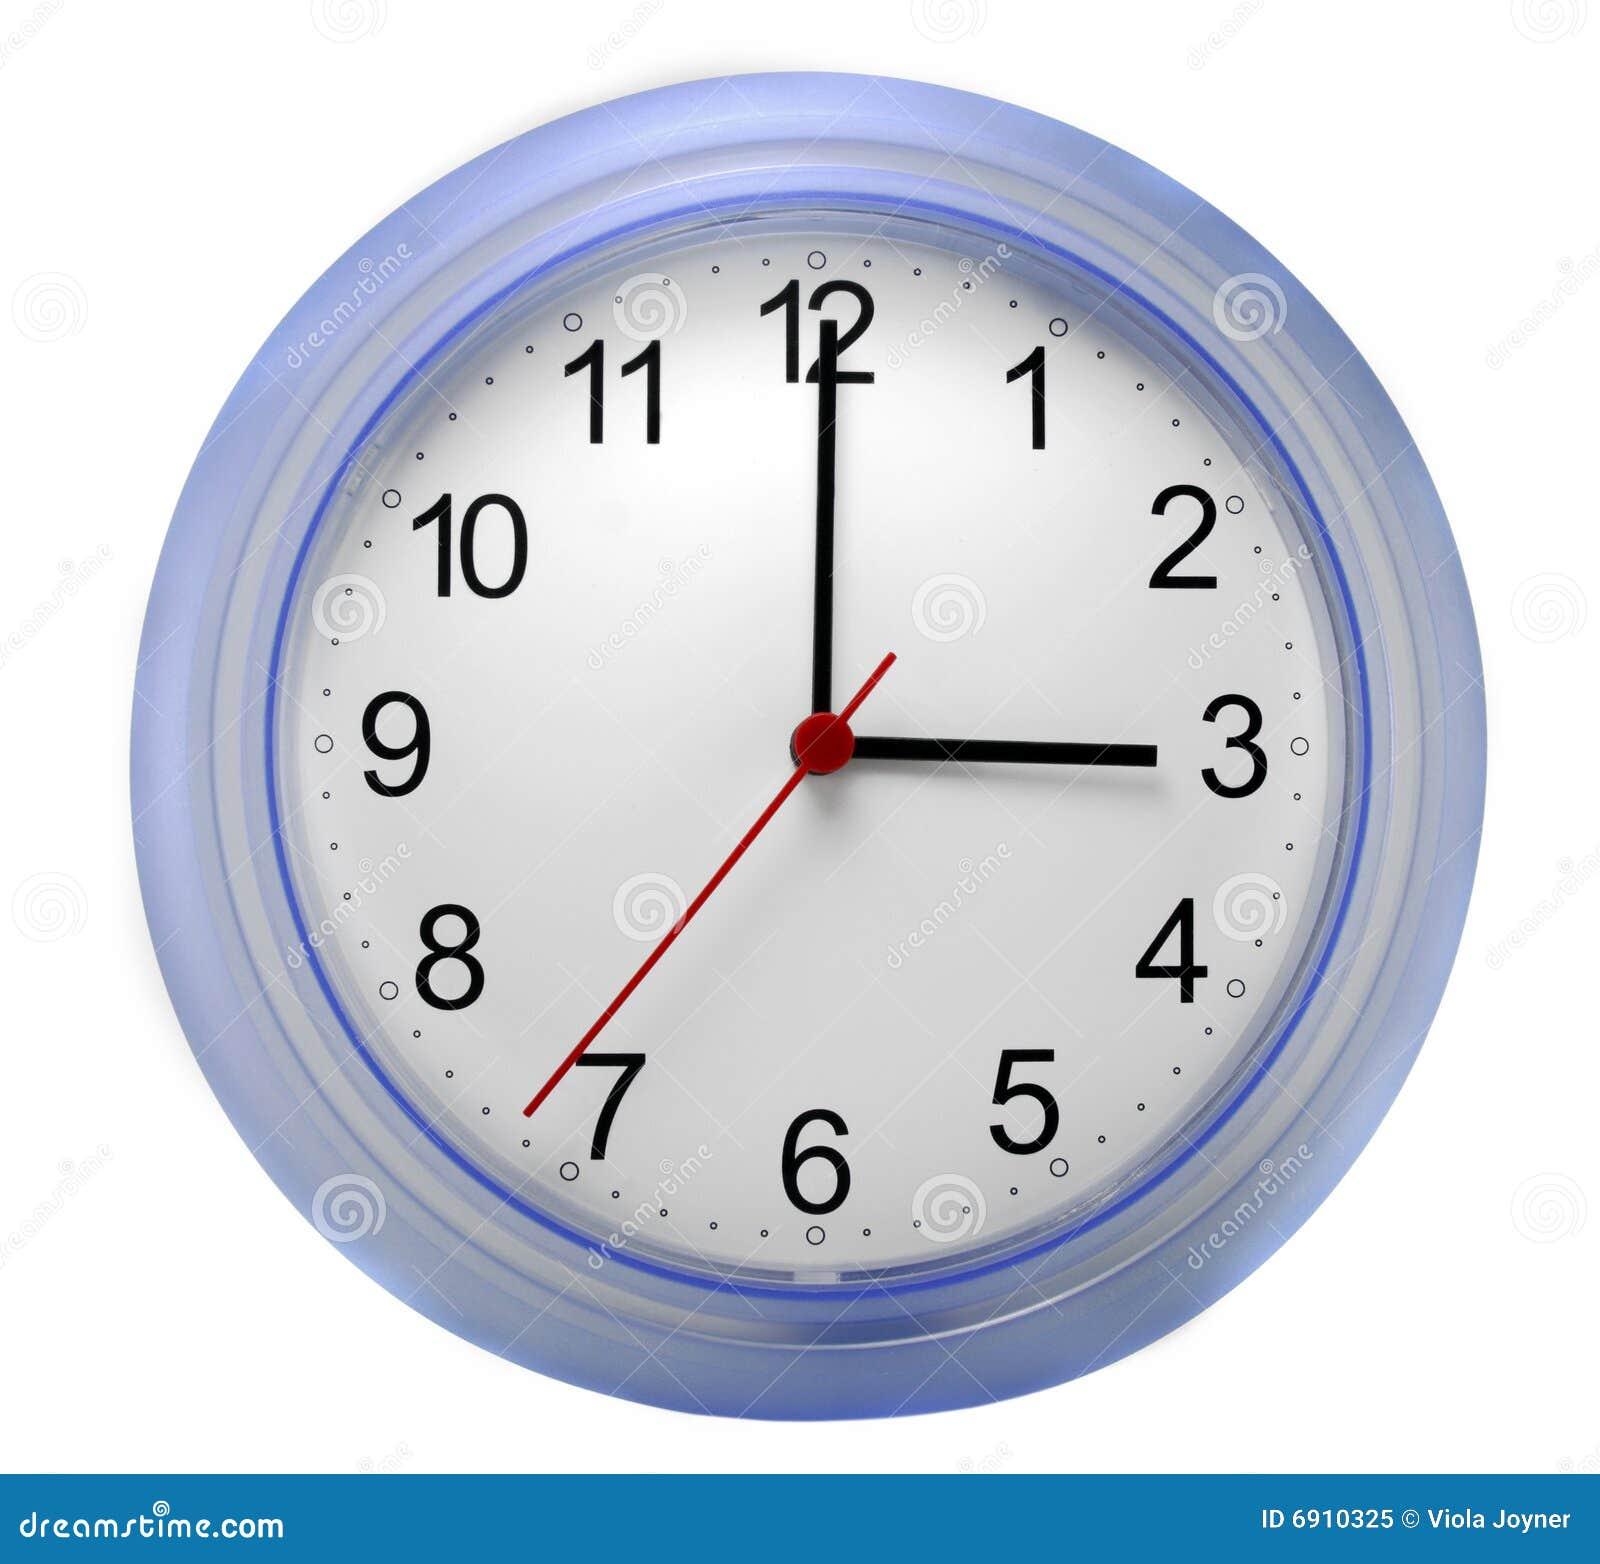 Reloj de pared foto de archivo libre de regal as imagen - Relojes de pared ...